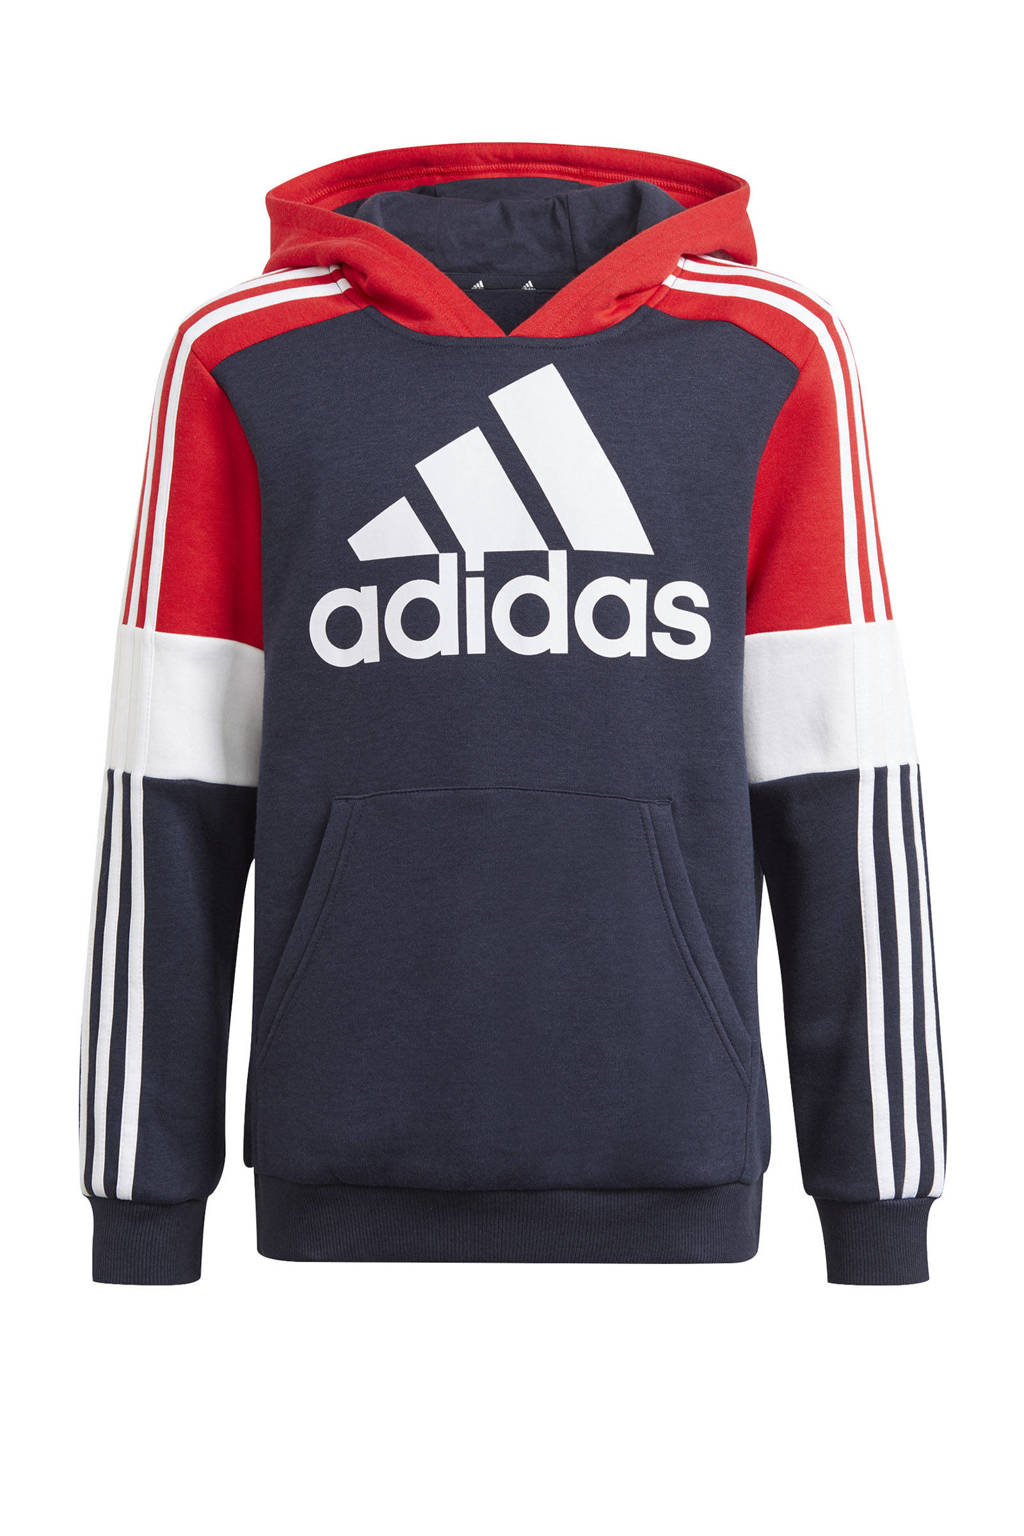 adidas Performance   fleece sporthoodie donkerblauw/rood/wit, Donkerblauw/rood/wit